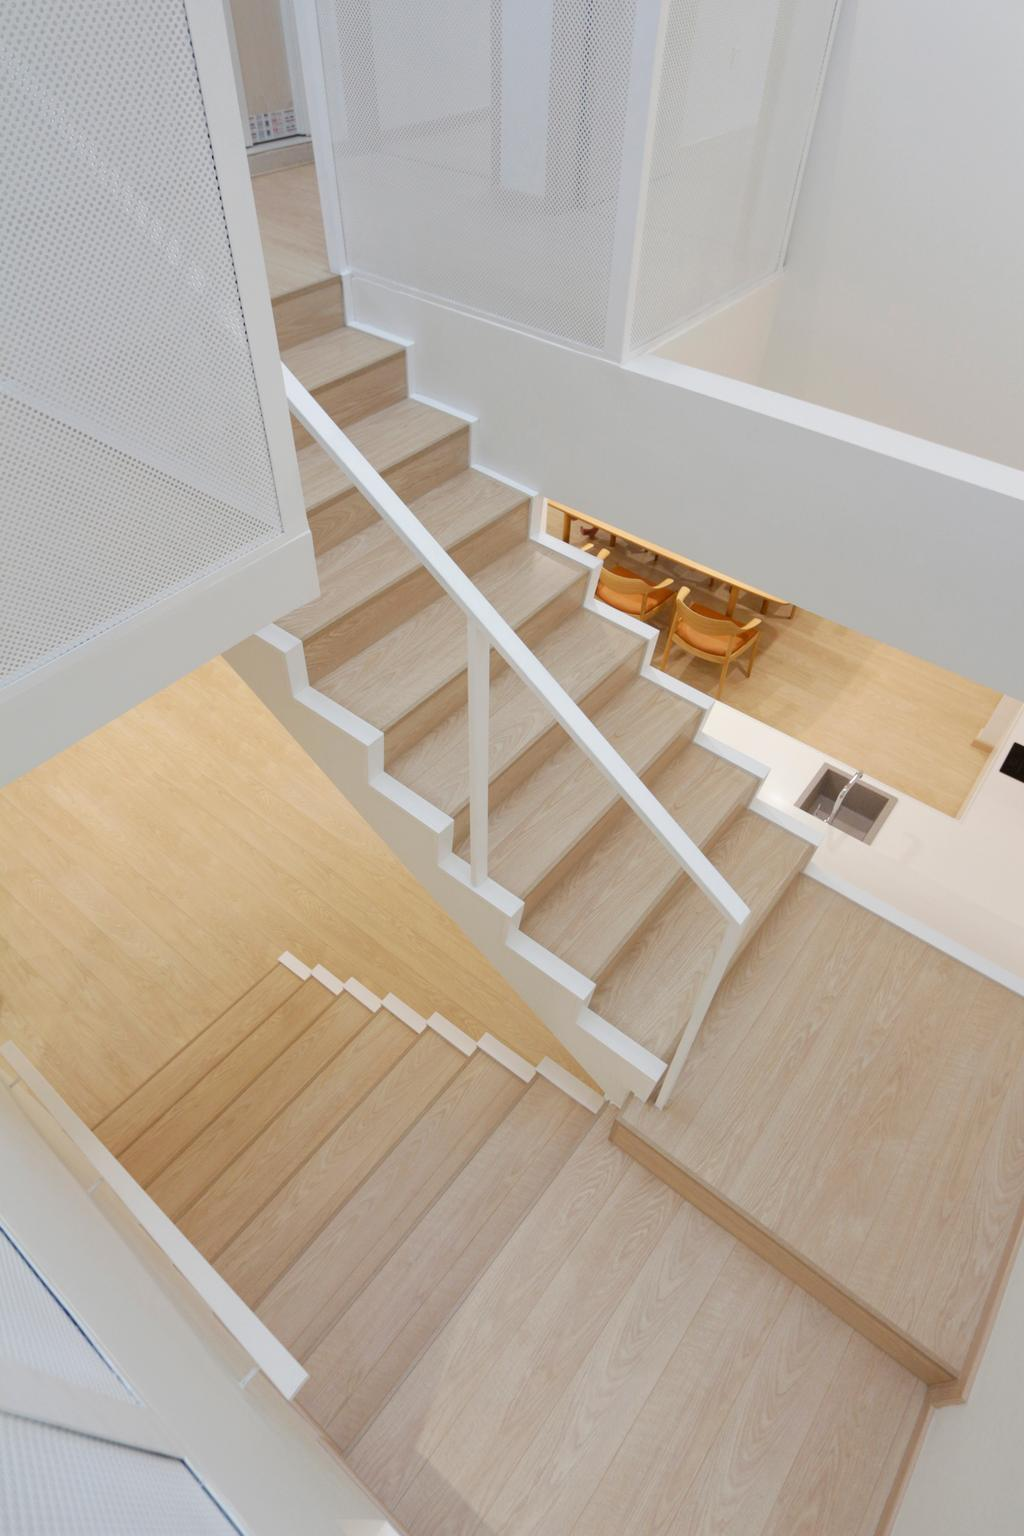 Minimalistic, Landed, Lentor Green, Architect, EHKA Studio, Wood, Banister, Handrail, Staircase